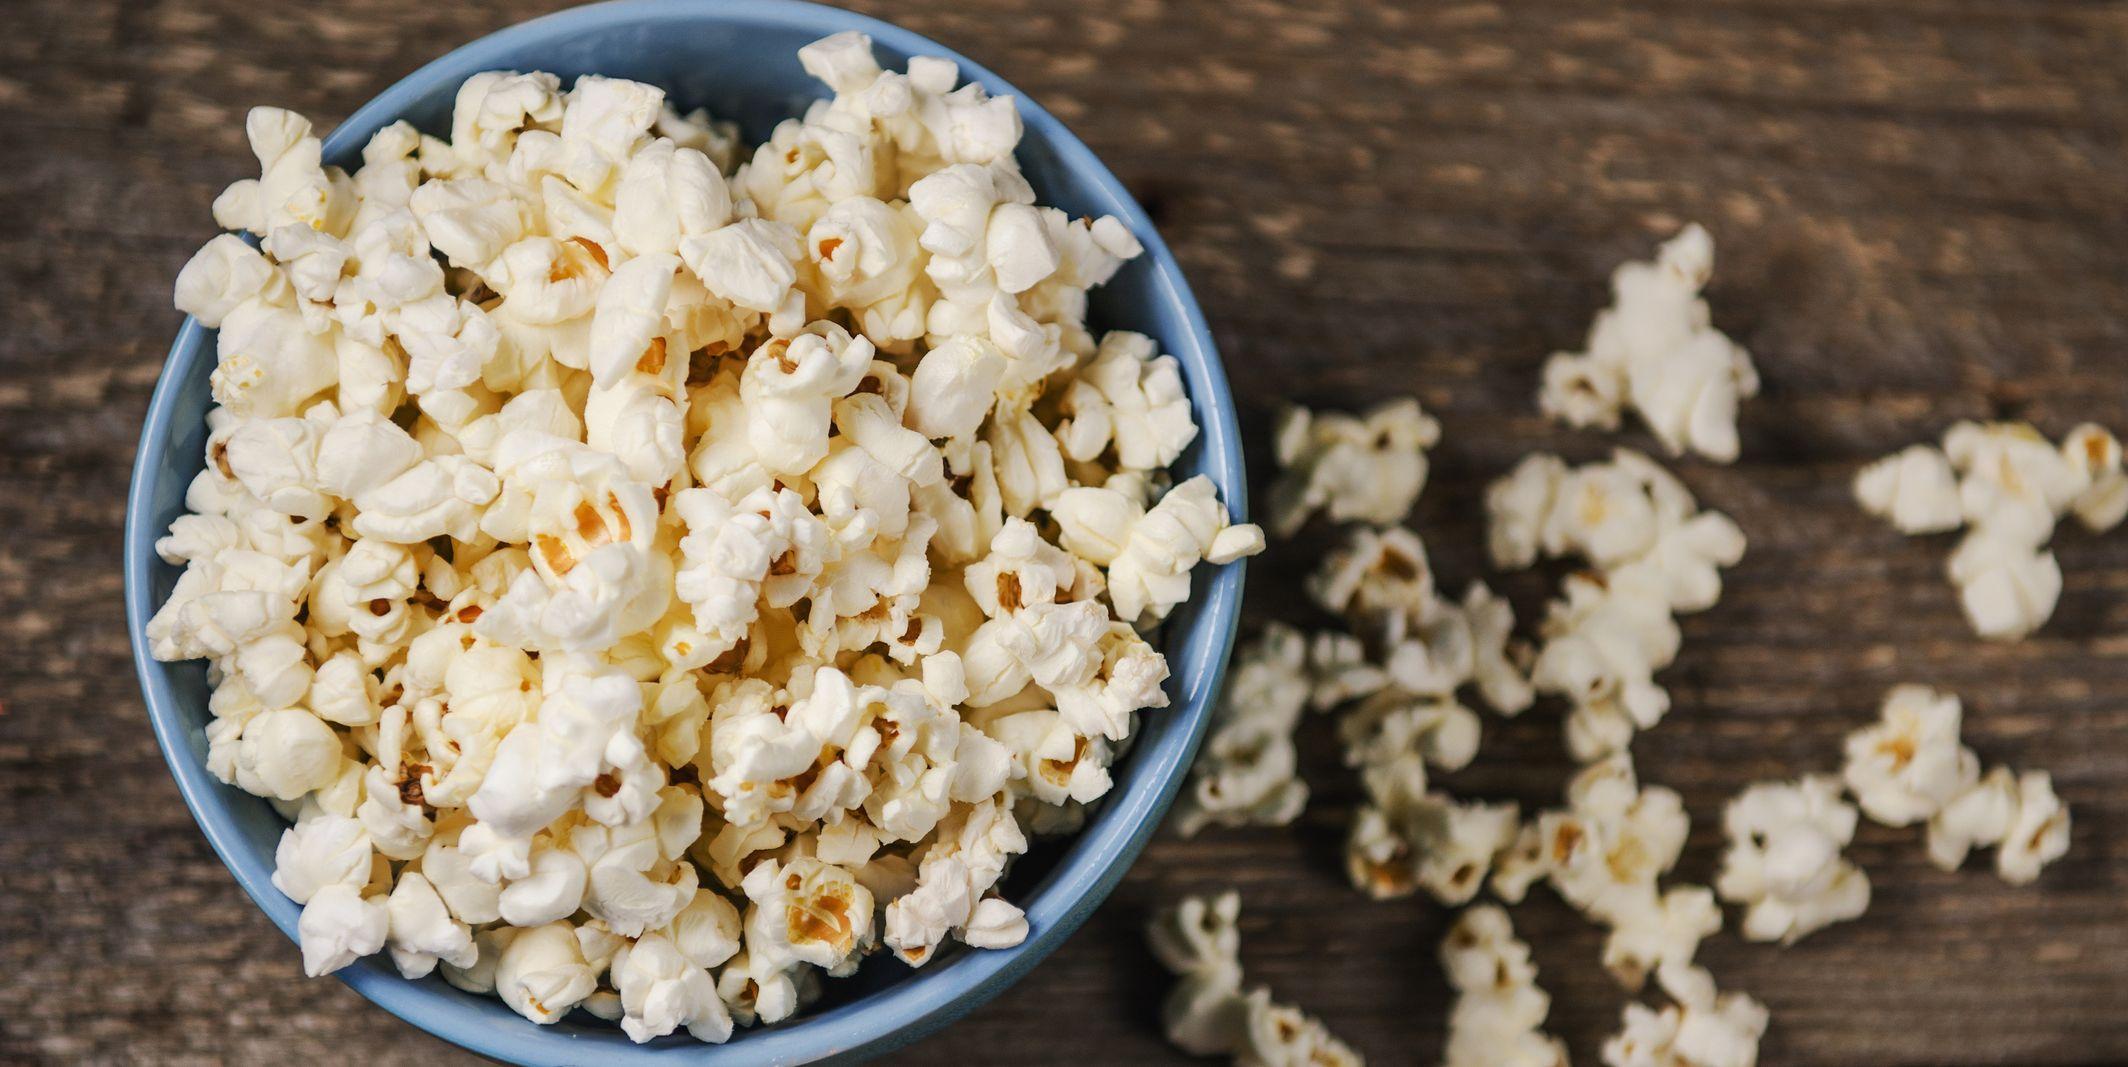 Popcorn bowl on table